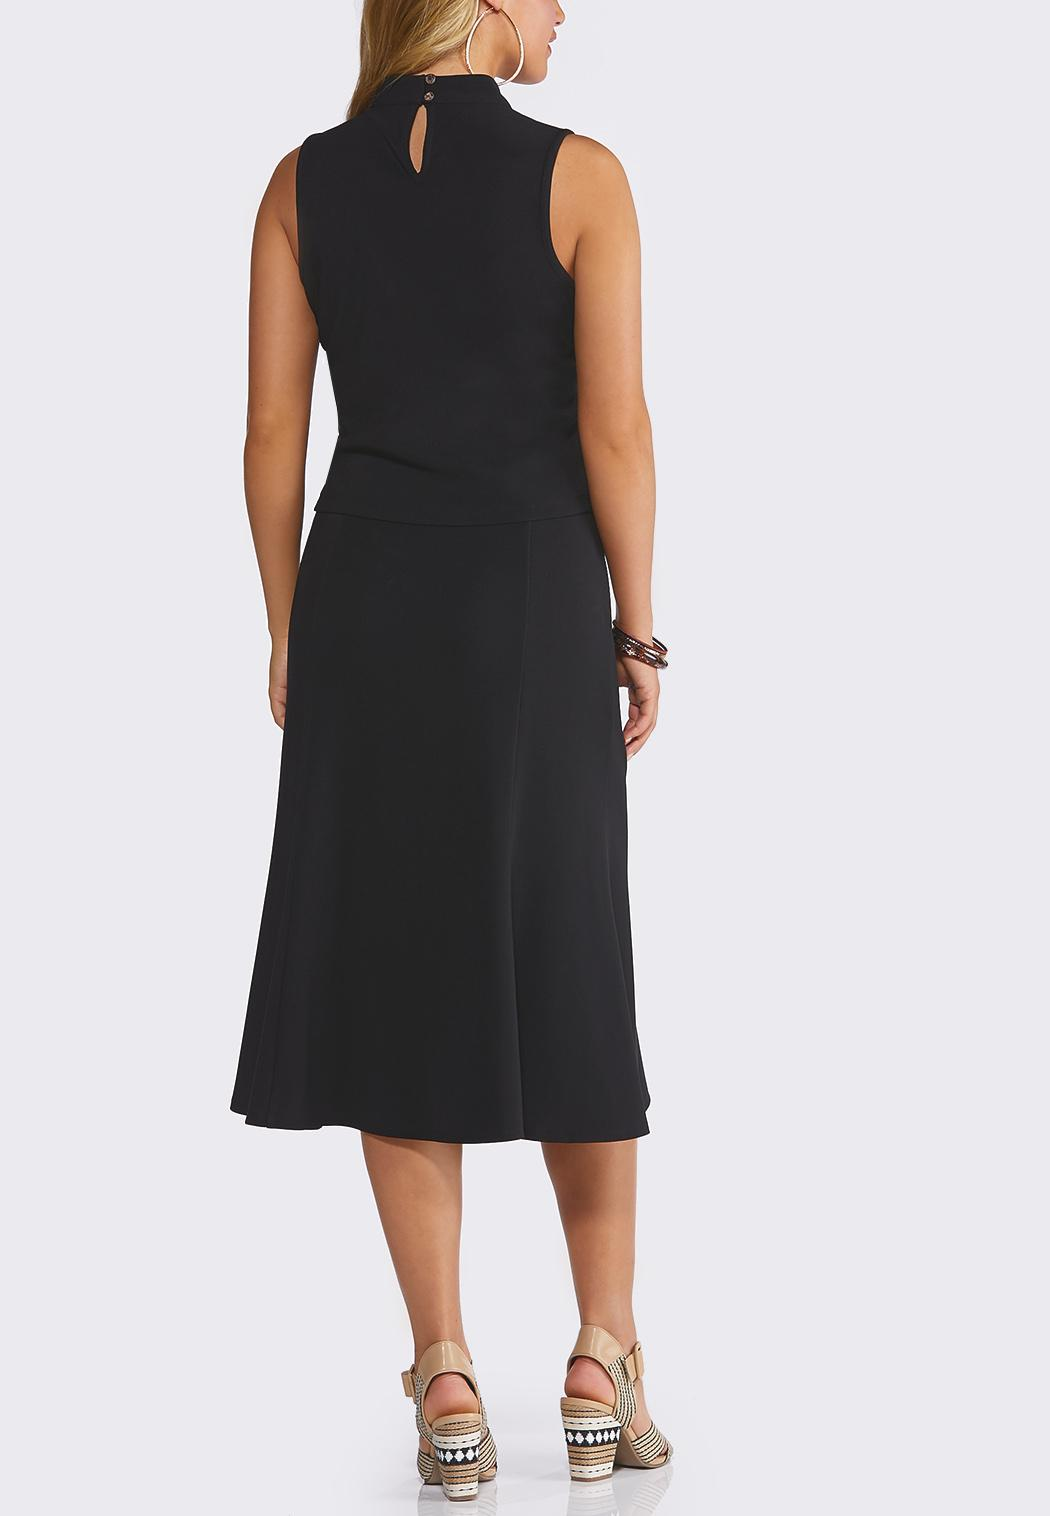 Ribbed Mock Neck Skirt Set (Item #44219560)